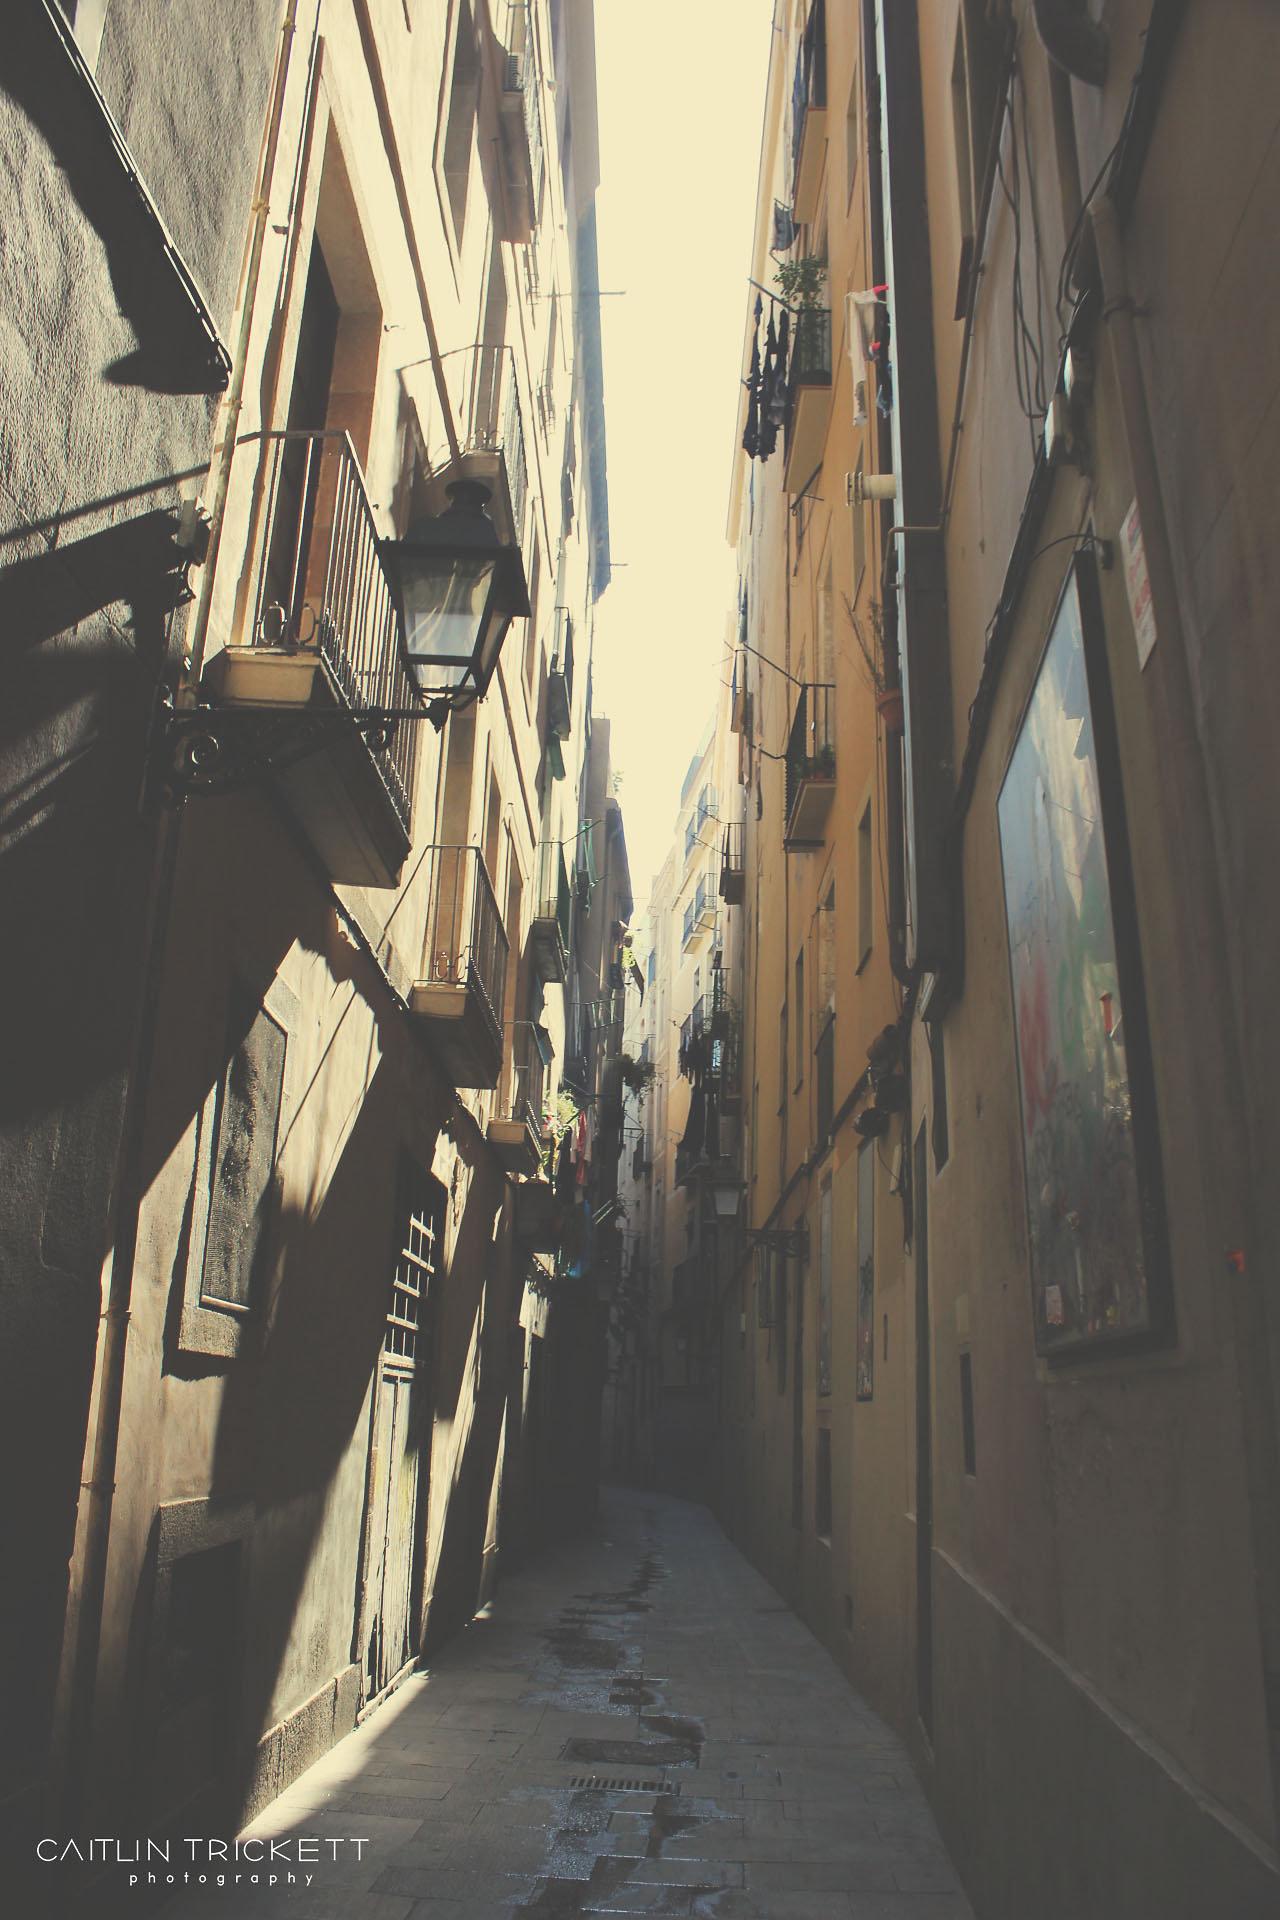 Barcelona, Spain (The Gothic Quarter)